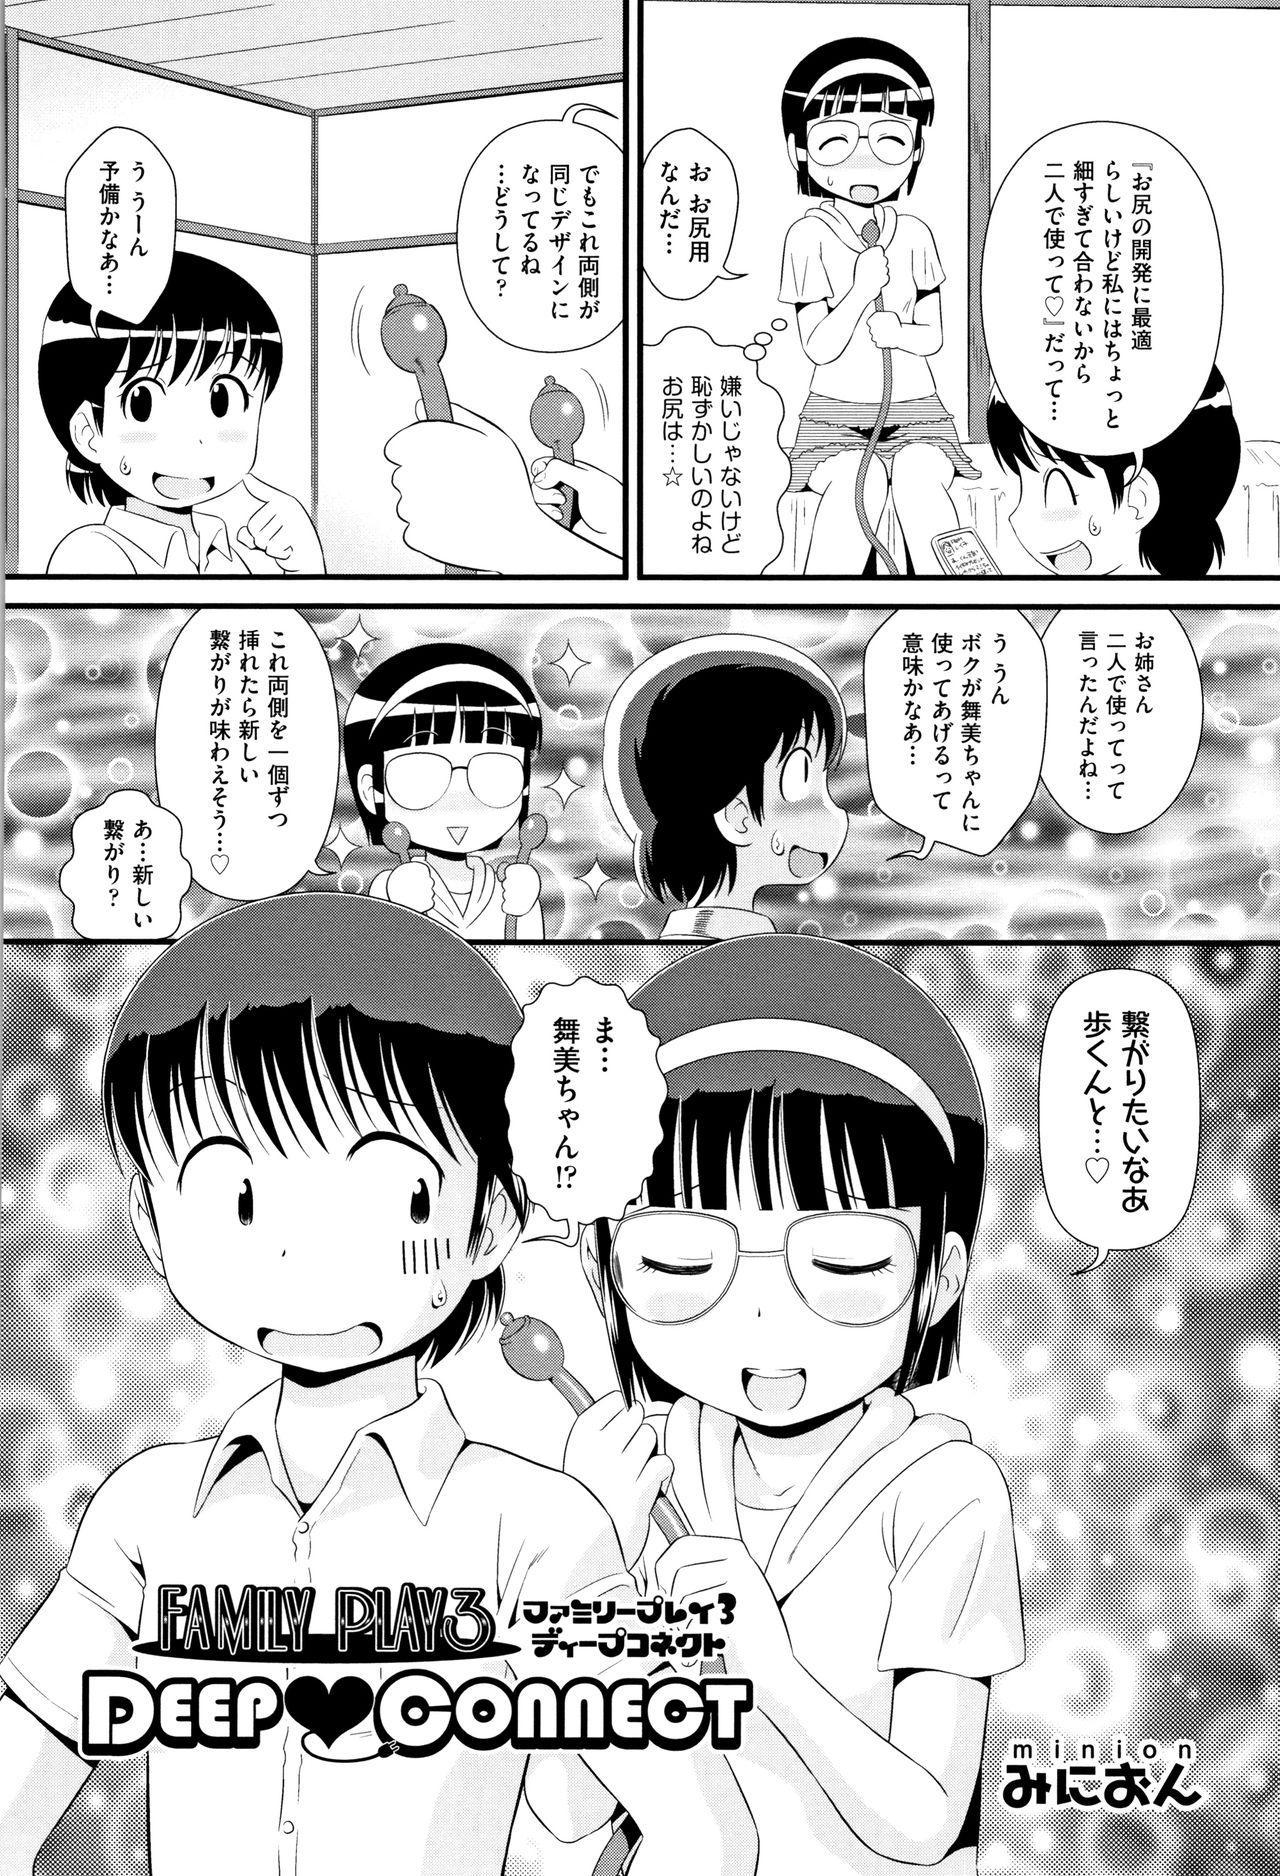 Shoujo Kumikyoku 11 66